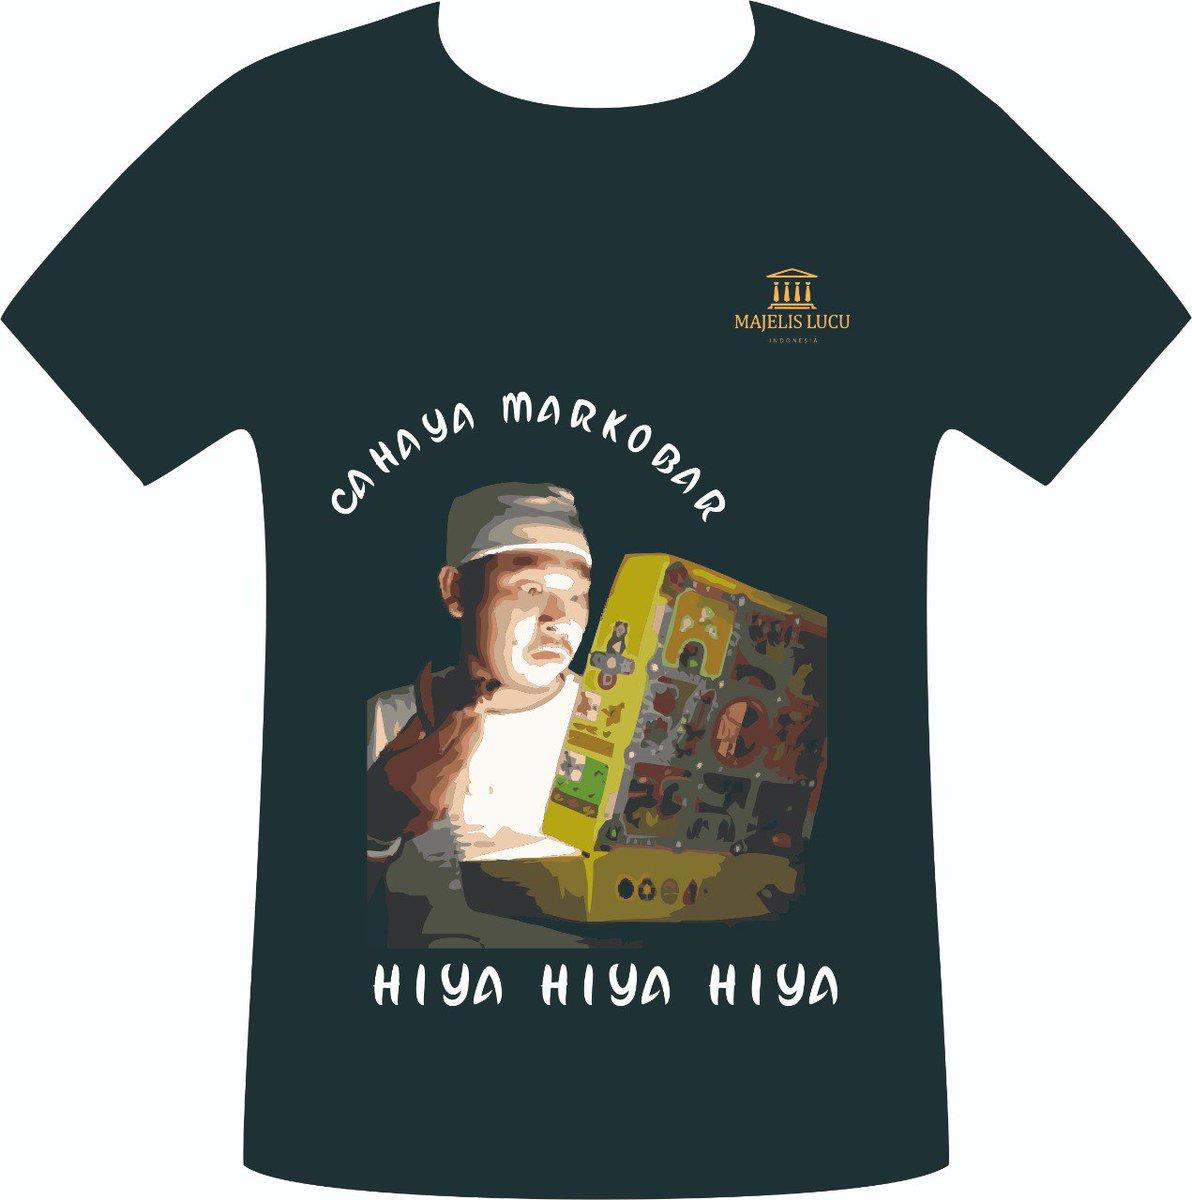 40 Best Stiker Majelis Lucu Indonesia | Stikjemboy